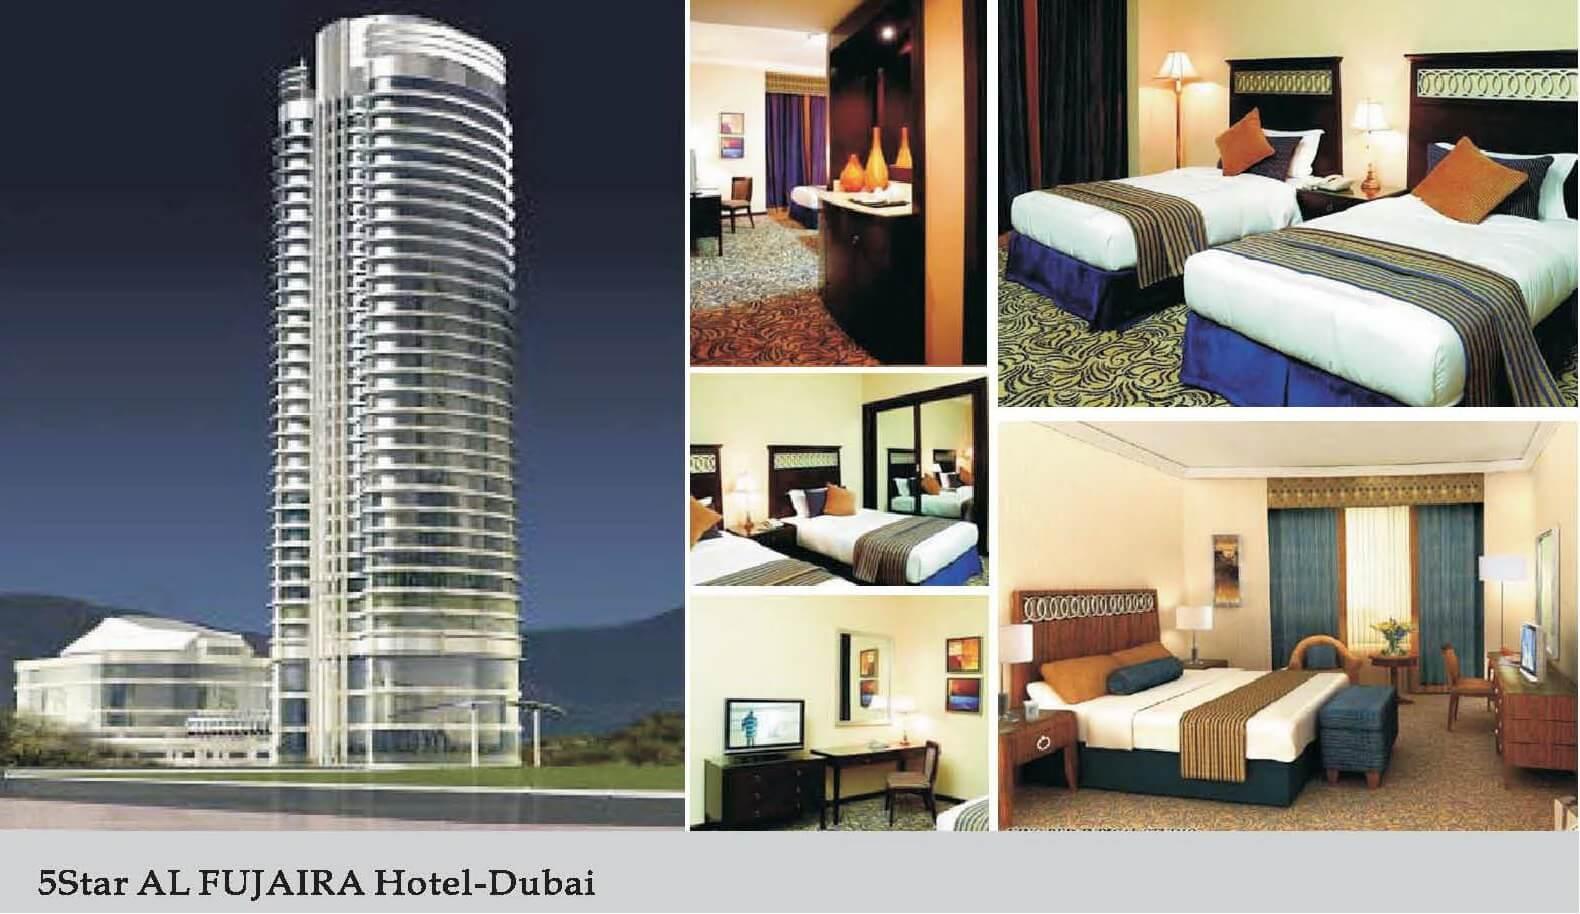 5-Star-AL-FUJAIRA-Hotel-Dubai